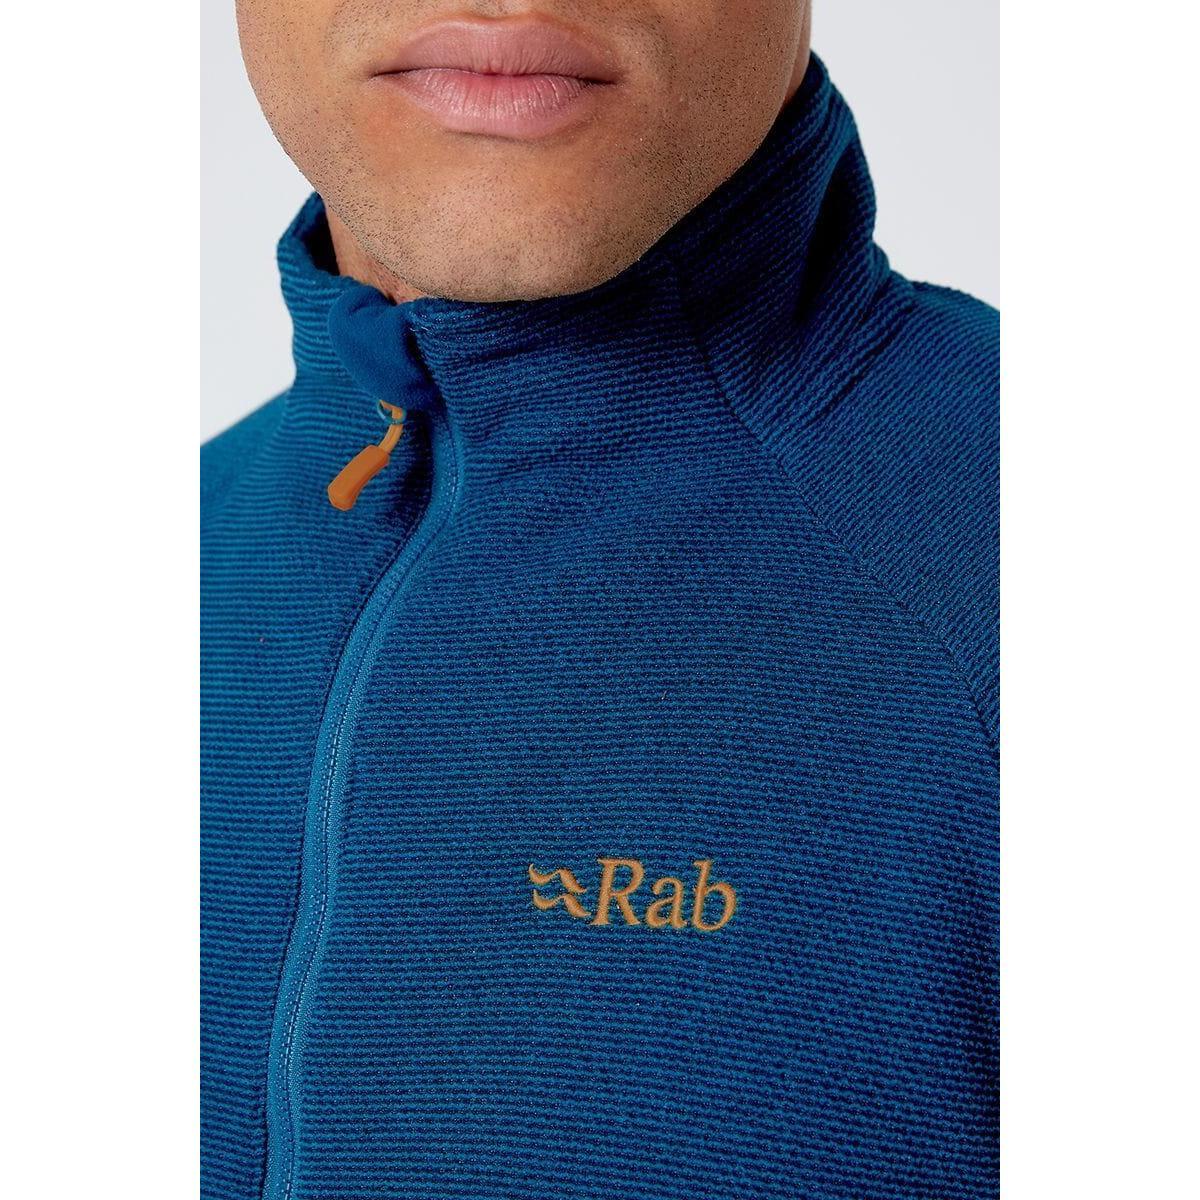 Rab Men's Rab Capacitor Pull On Fleece - Navy